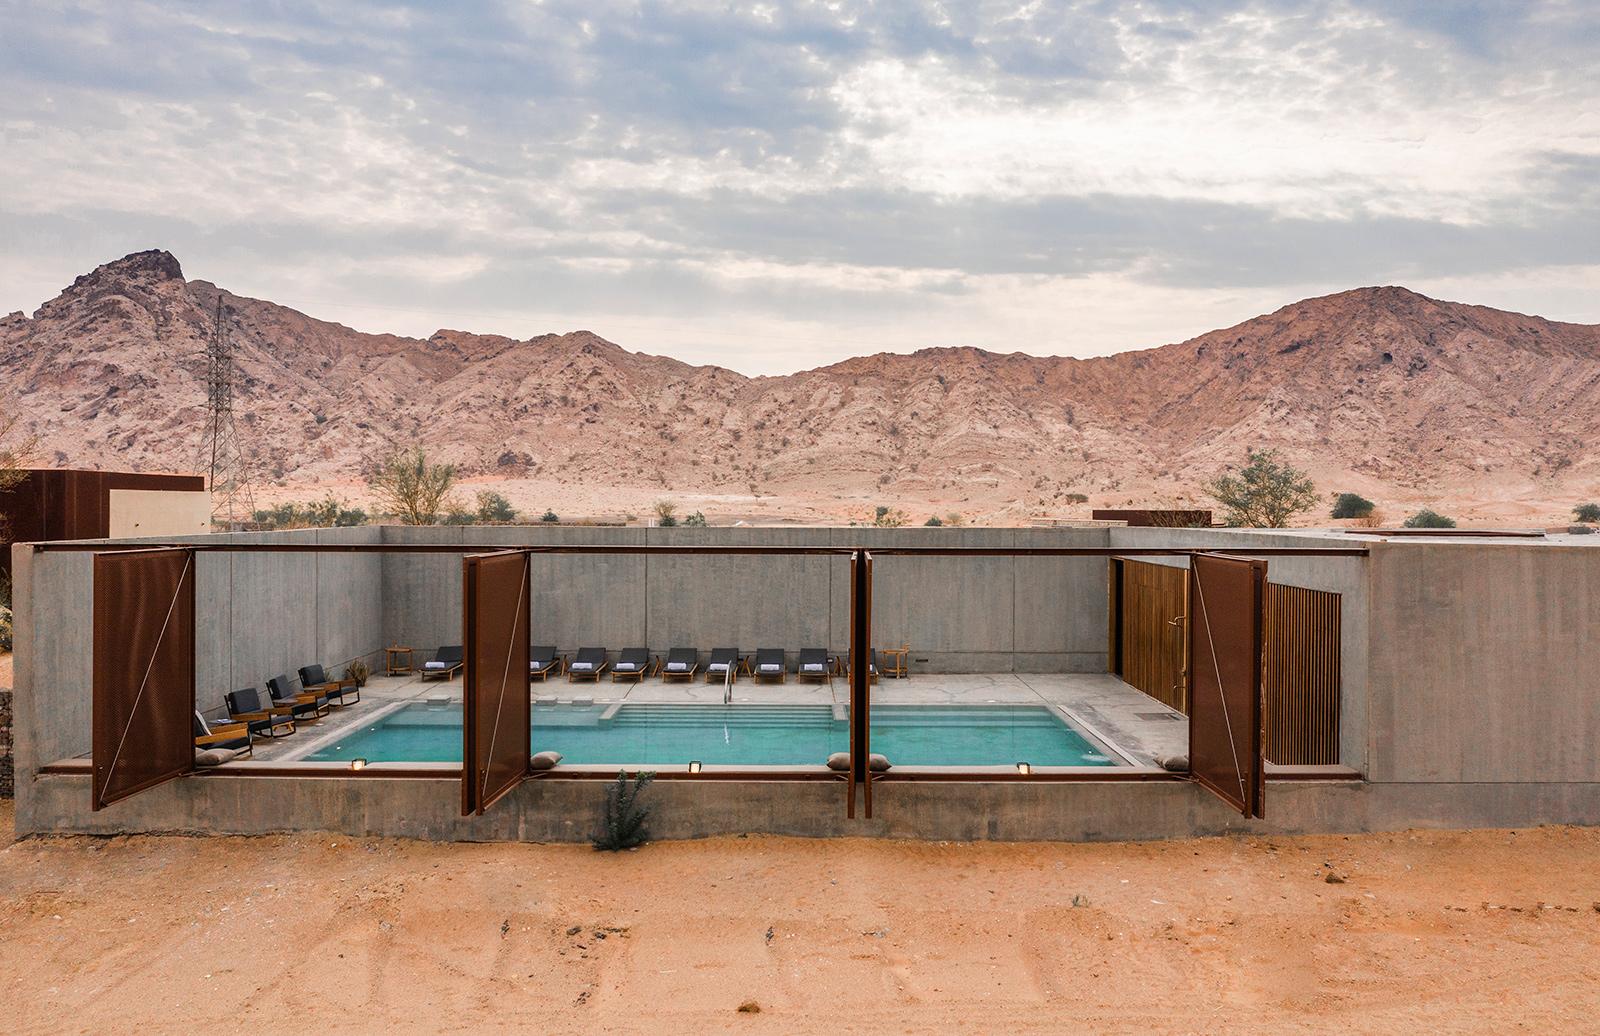 Al Faya Lodge - a minimalist spa in the desert